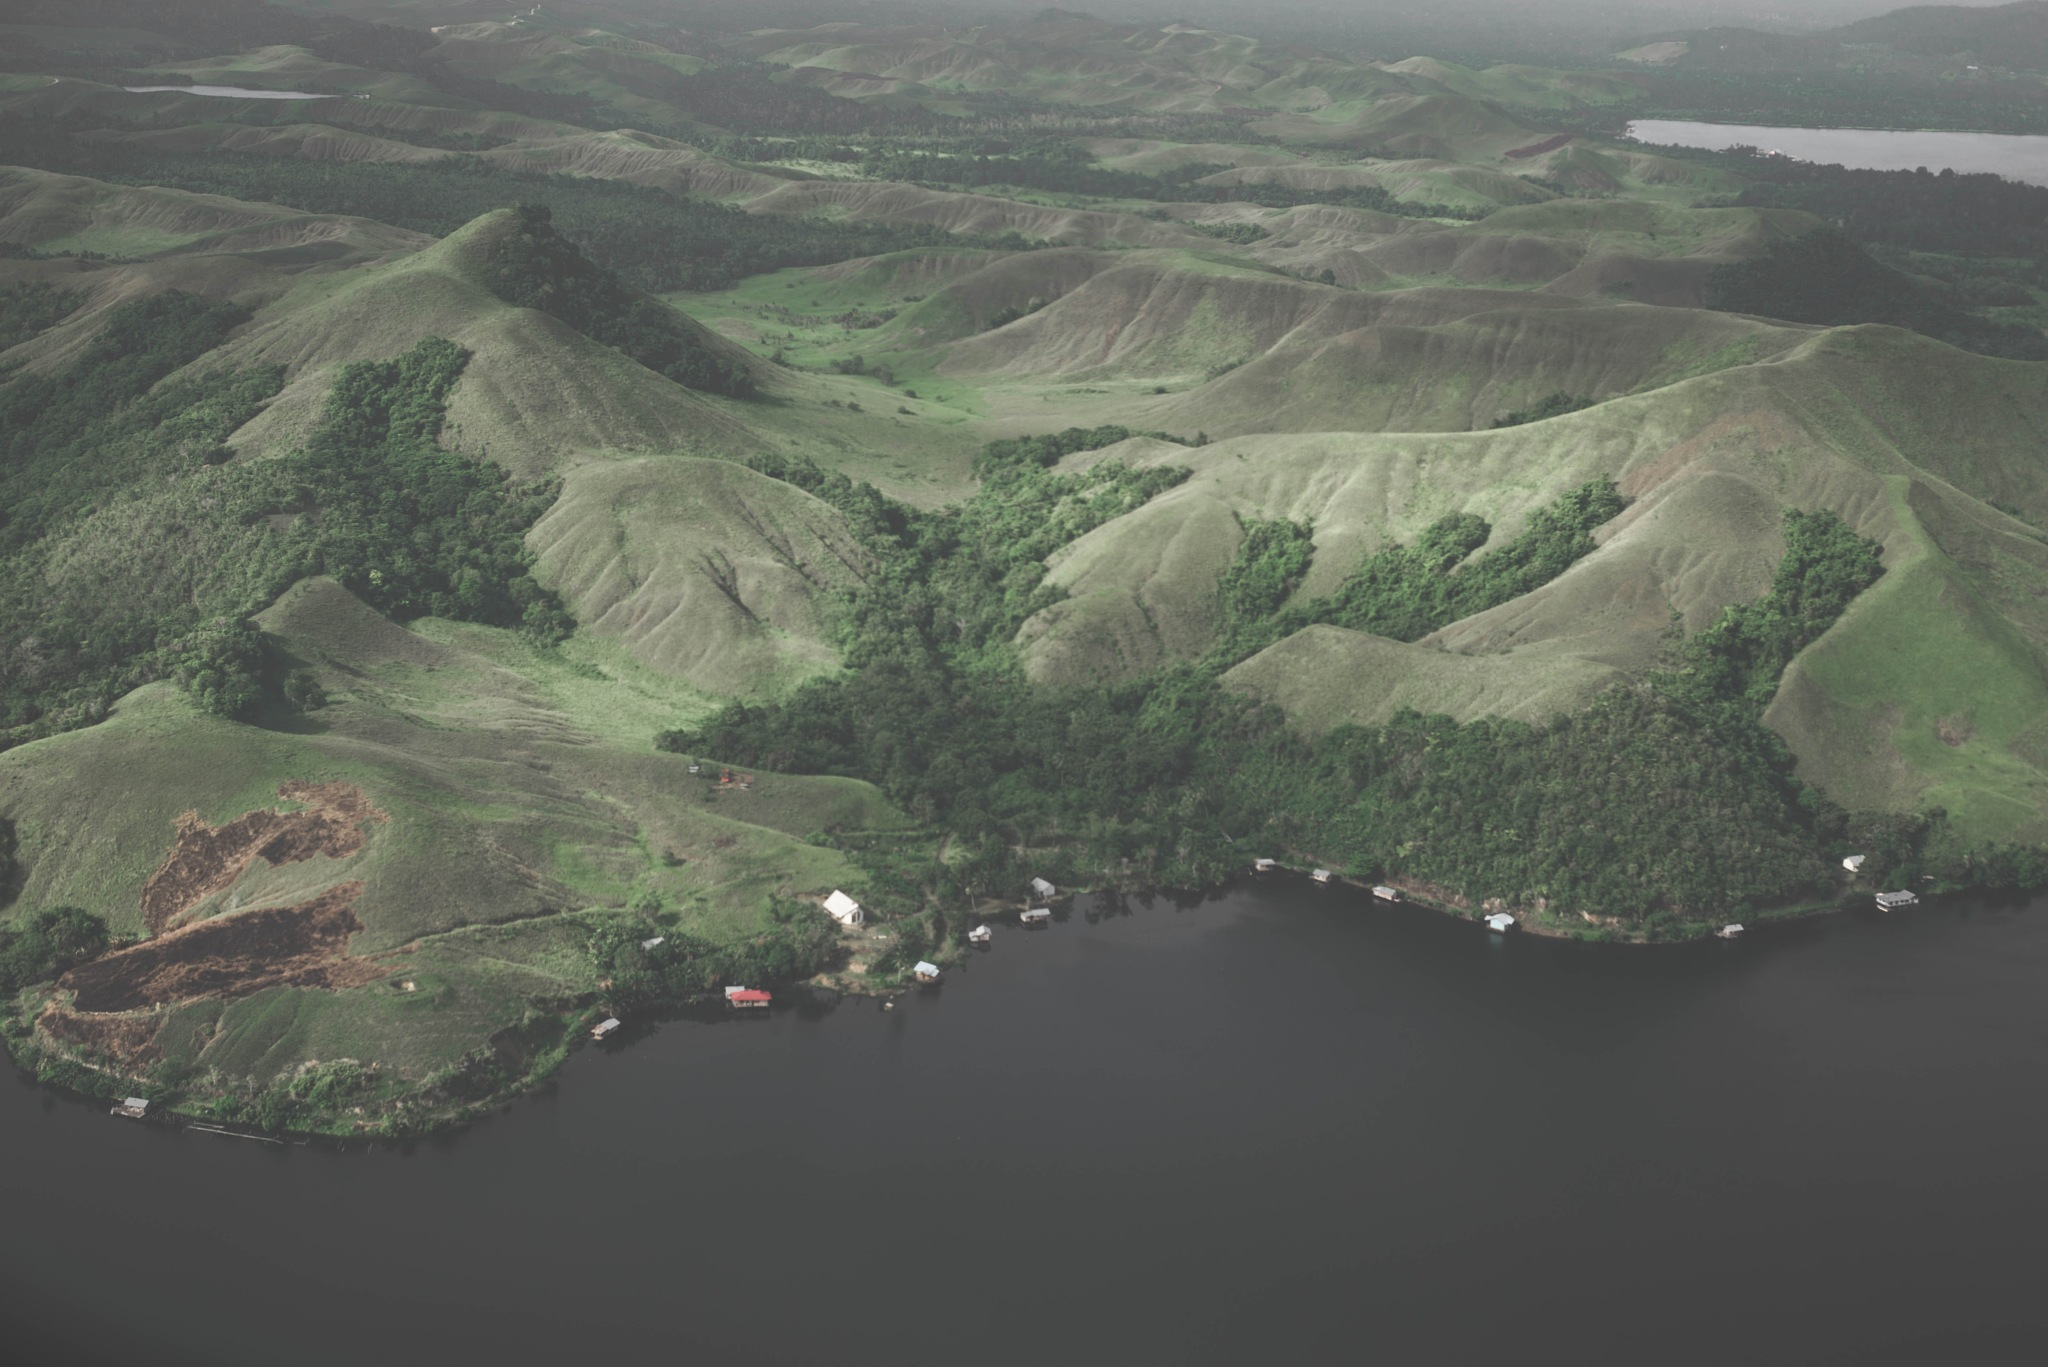 landscape of sentani lake, jayapura,papua,Indonesia by Imanuelsawaki